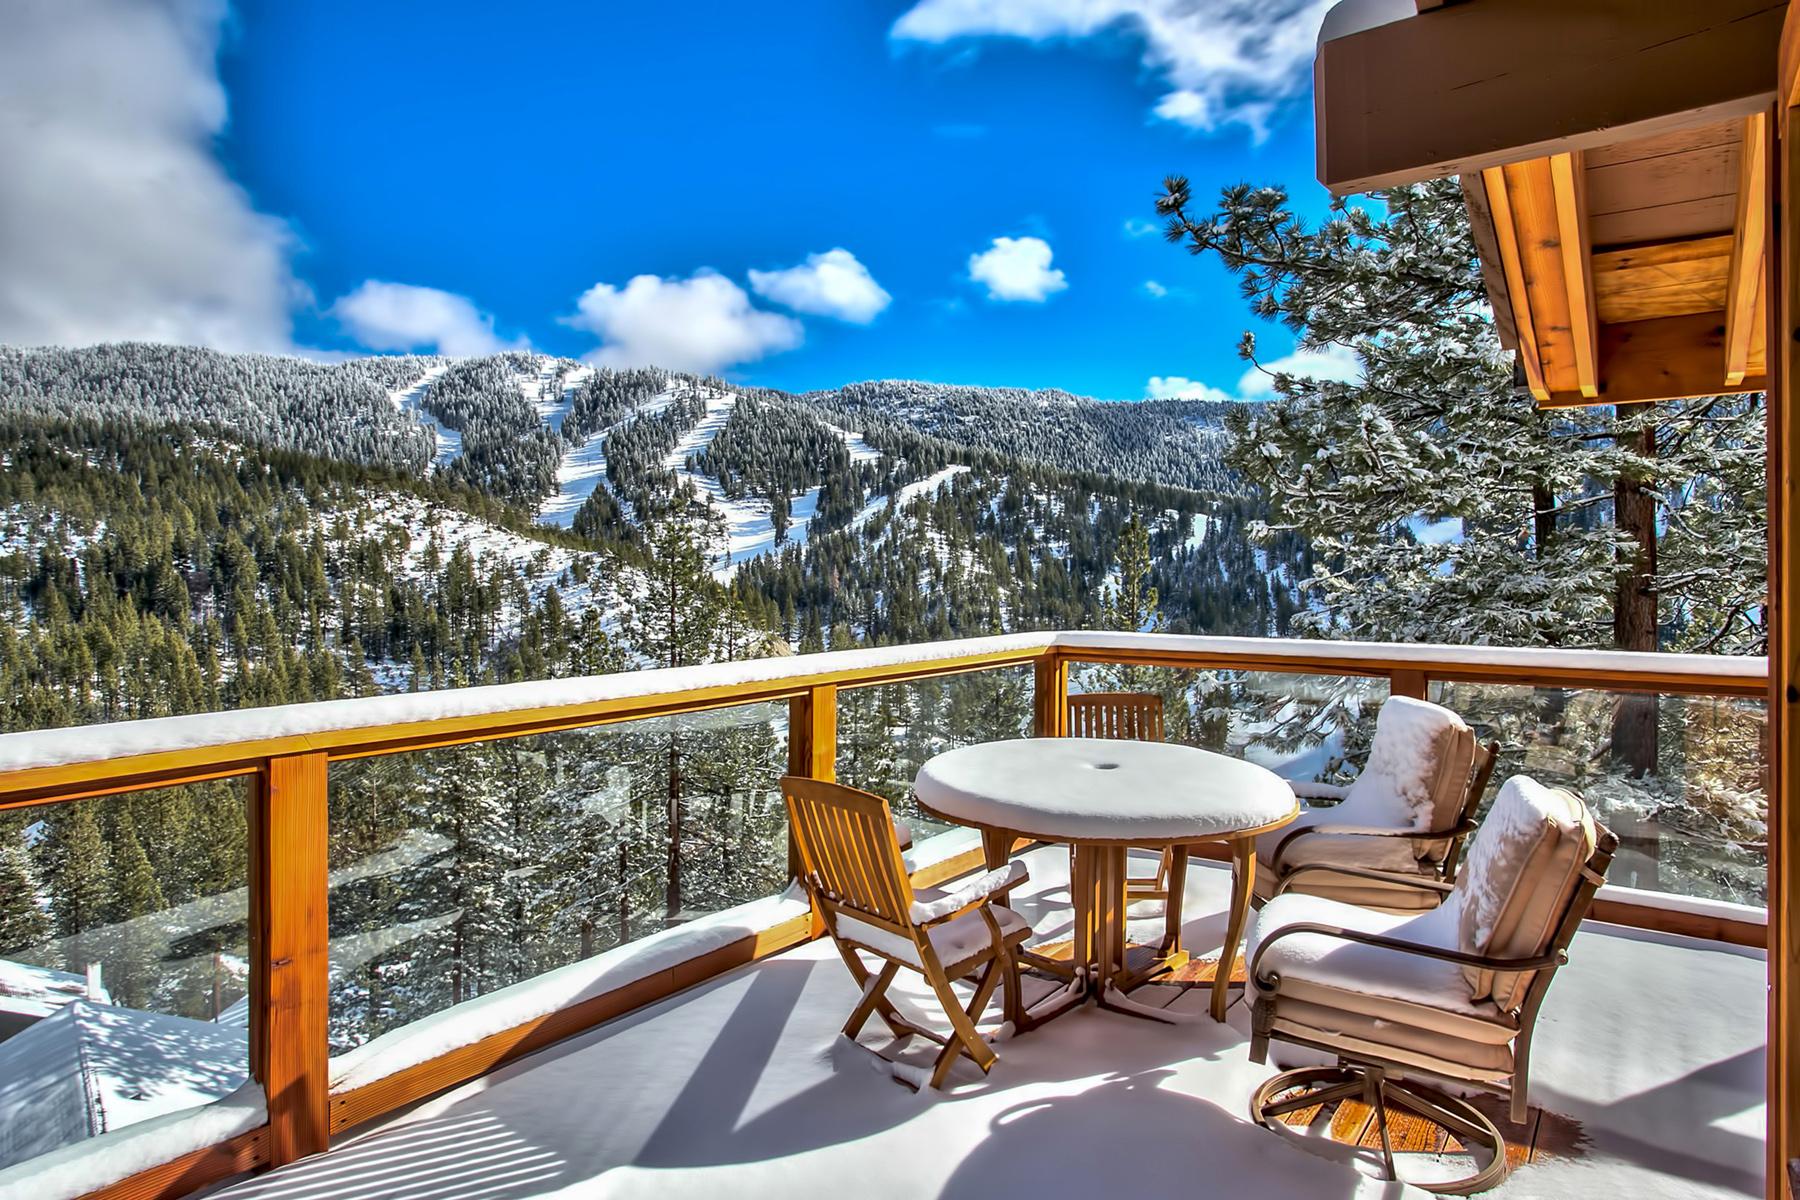 Residência urbana para Venda às 1479 Tirol Drive Incline Village, Nevada, 89451 Lake Tahoe Region, Estados Unidos